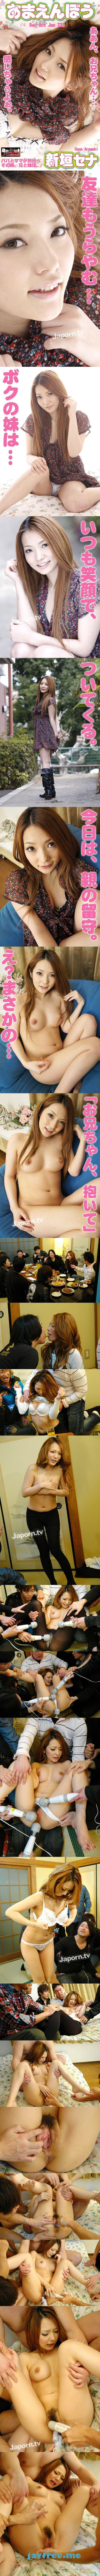 [DVD][RHJ 233] Red Hot Jam Vol.233 : Sena Aragaki 新垣セナ Sena Aragaki RHJ